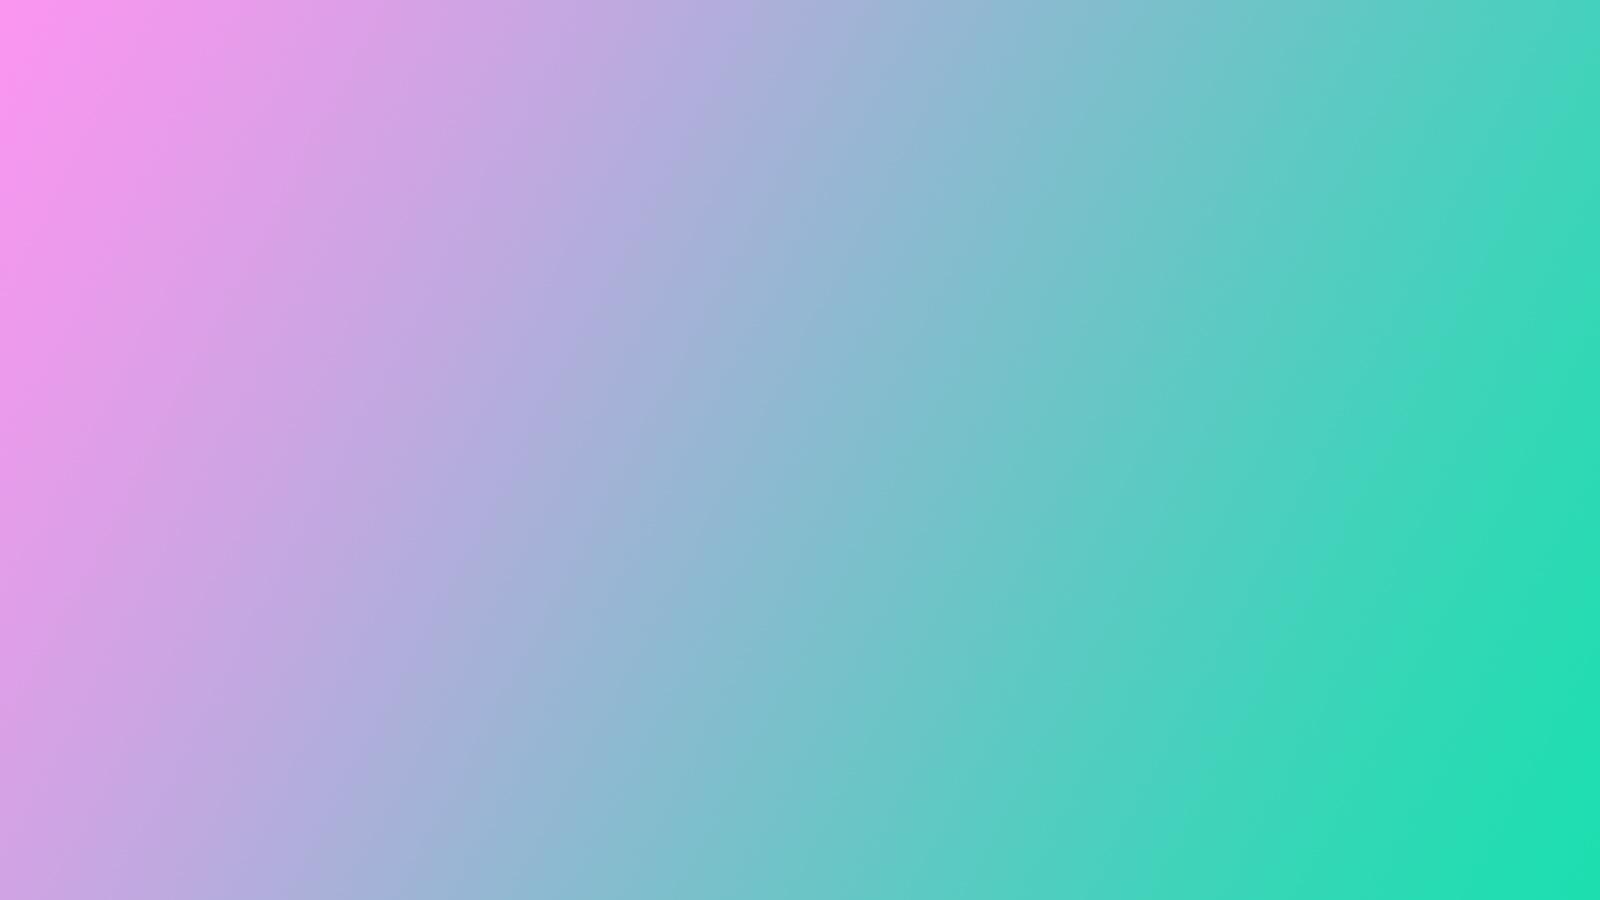 pastel tumblr backgrounds soft grunge tumblr backgrounds pastel cloud 1600x900